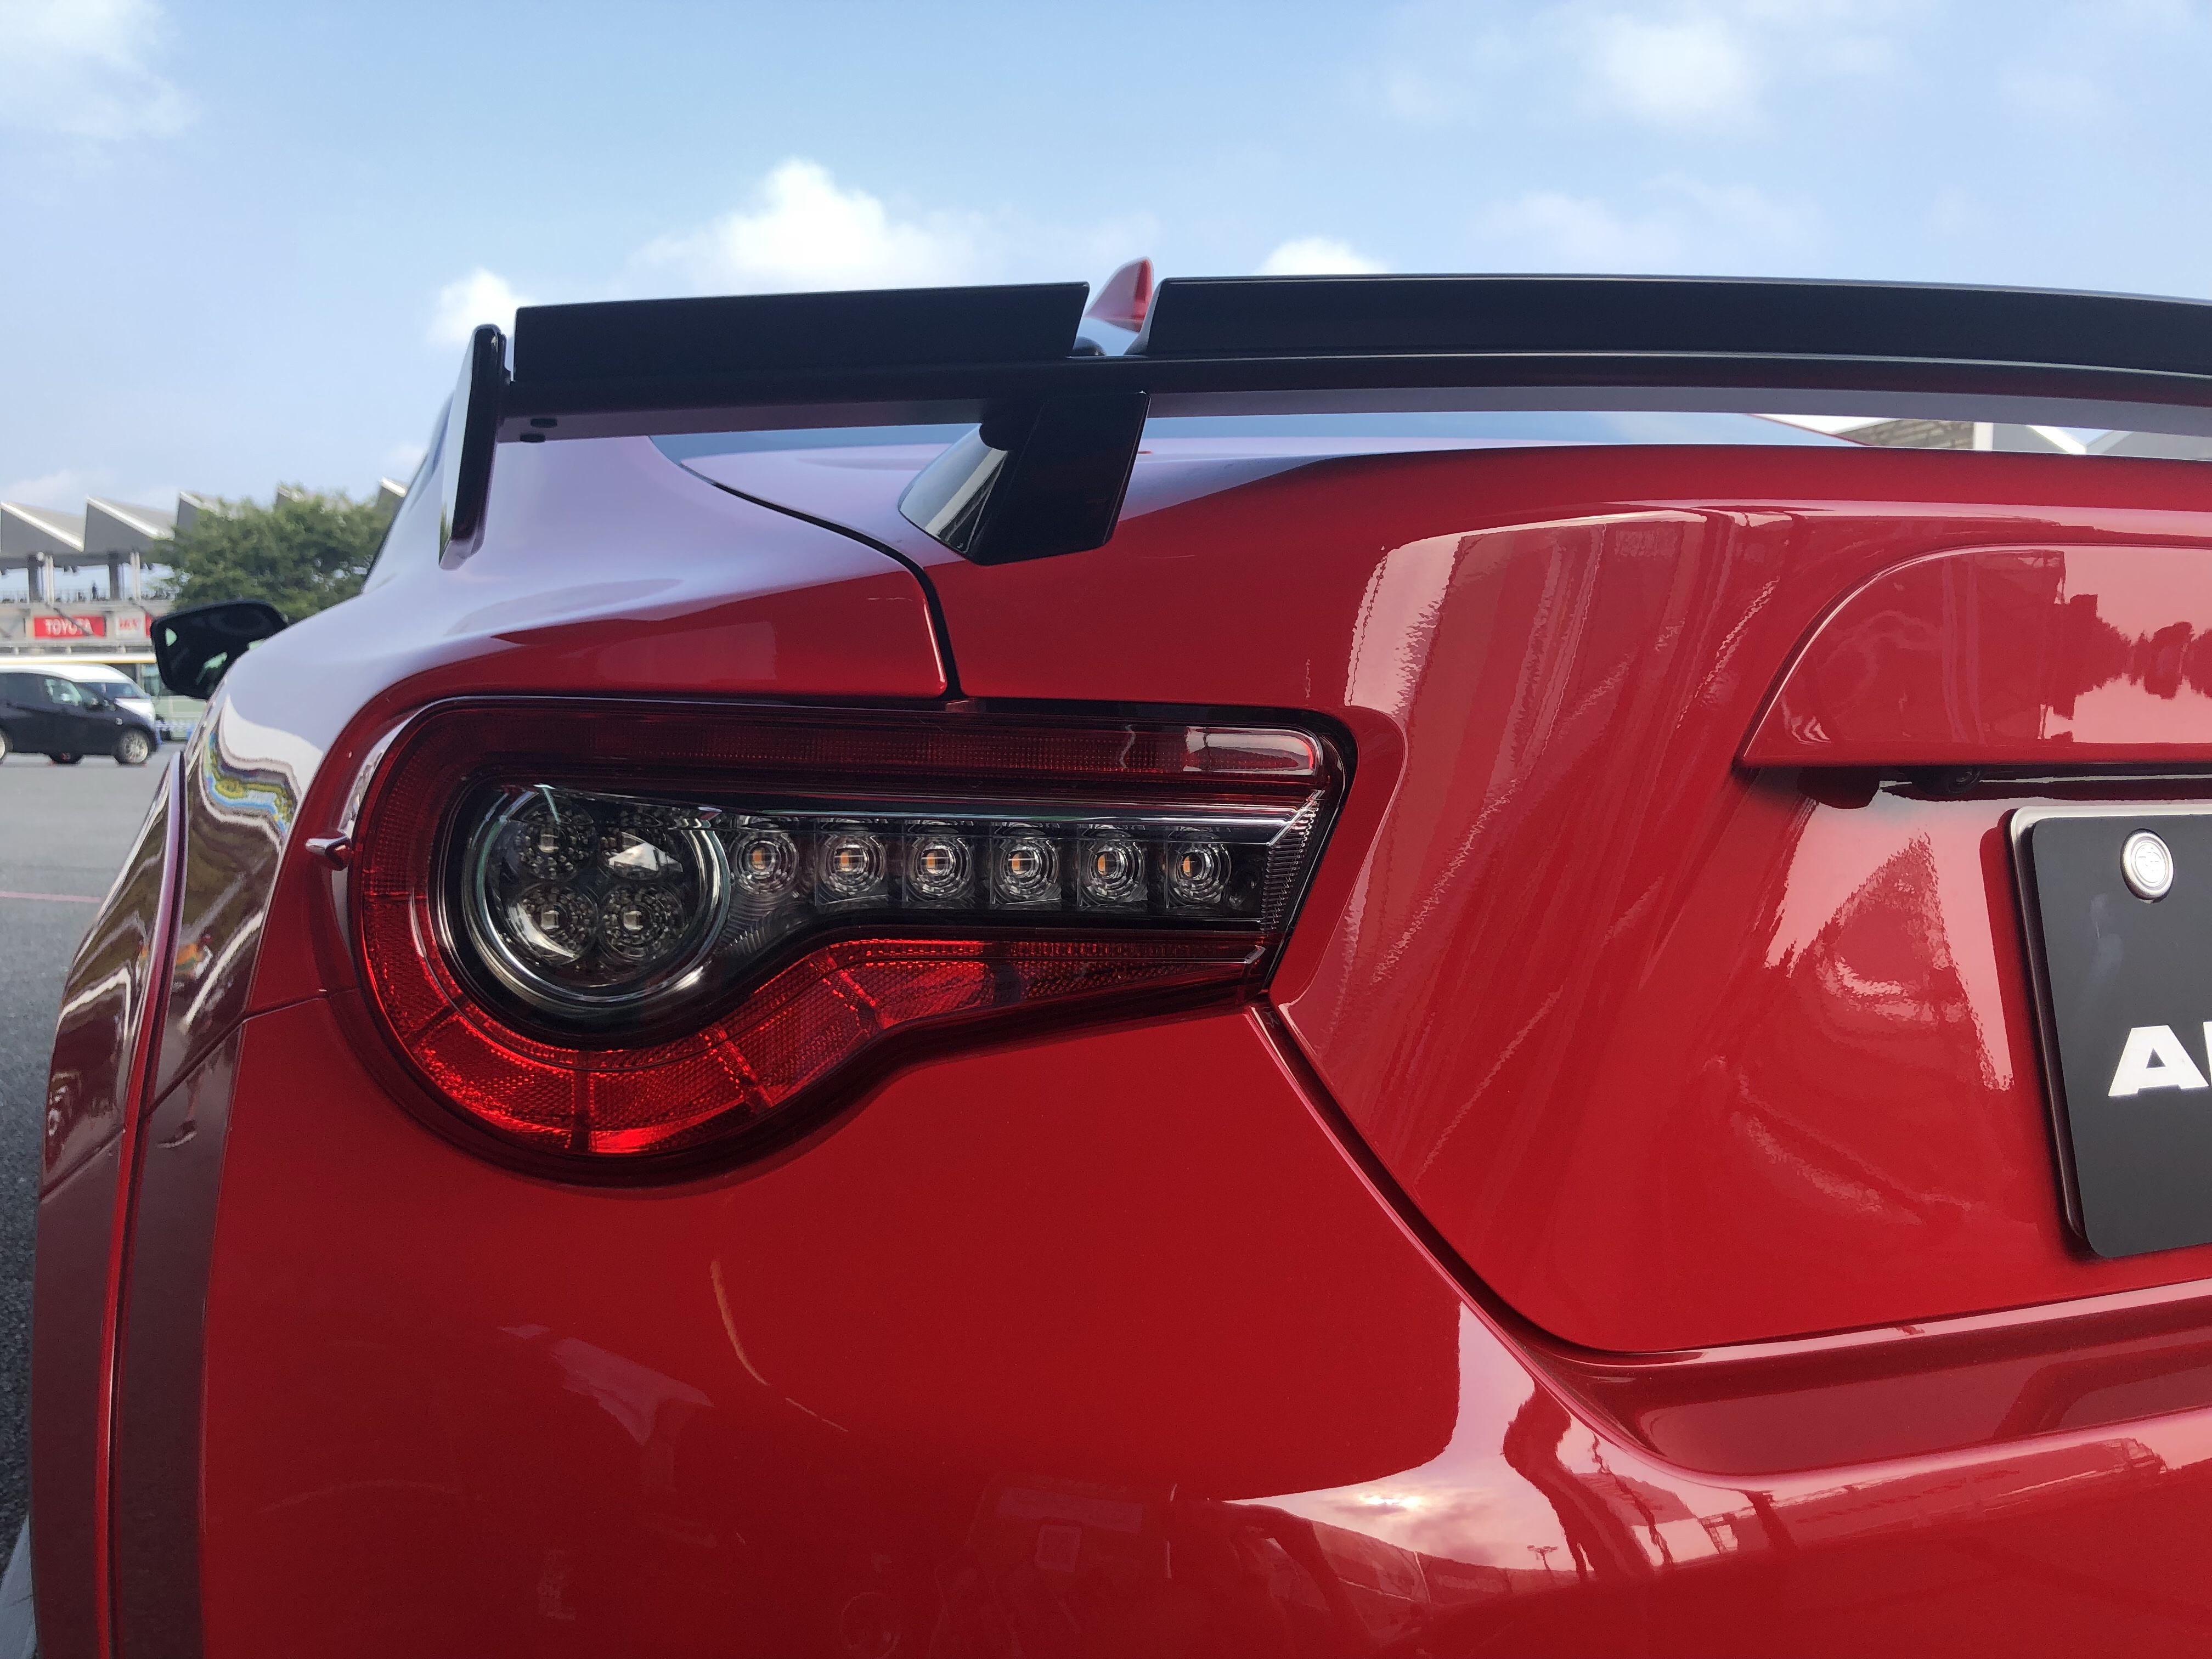 Super GT 富士500マイルレース観戦と、帰り道の偶然の出会い